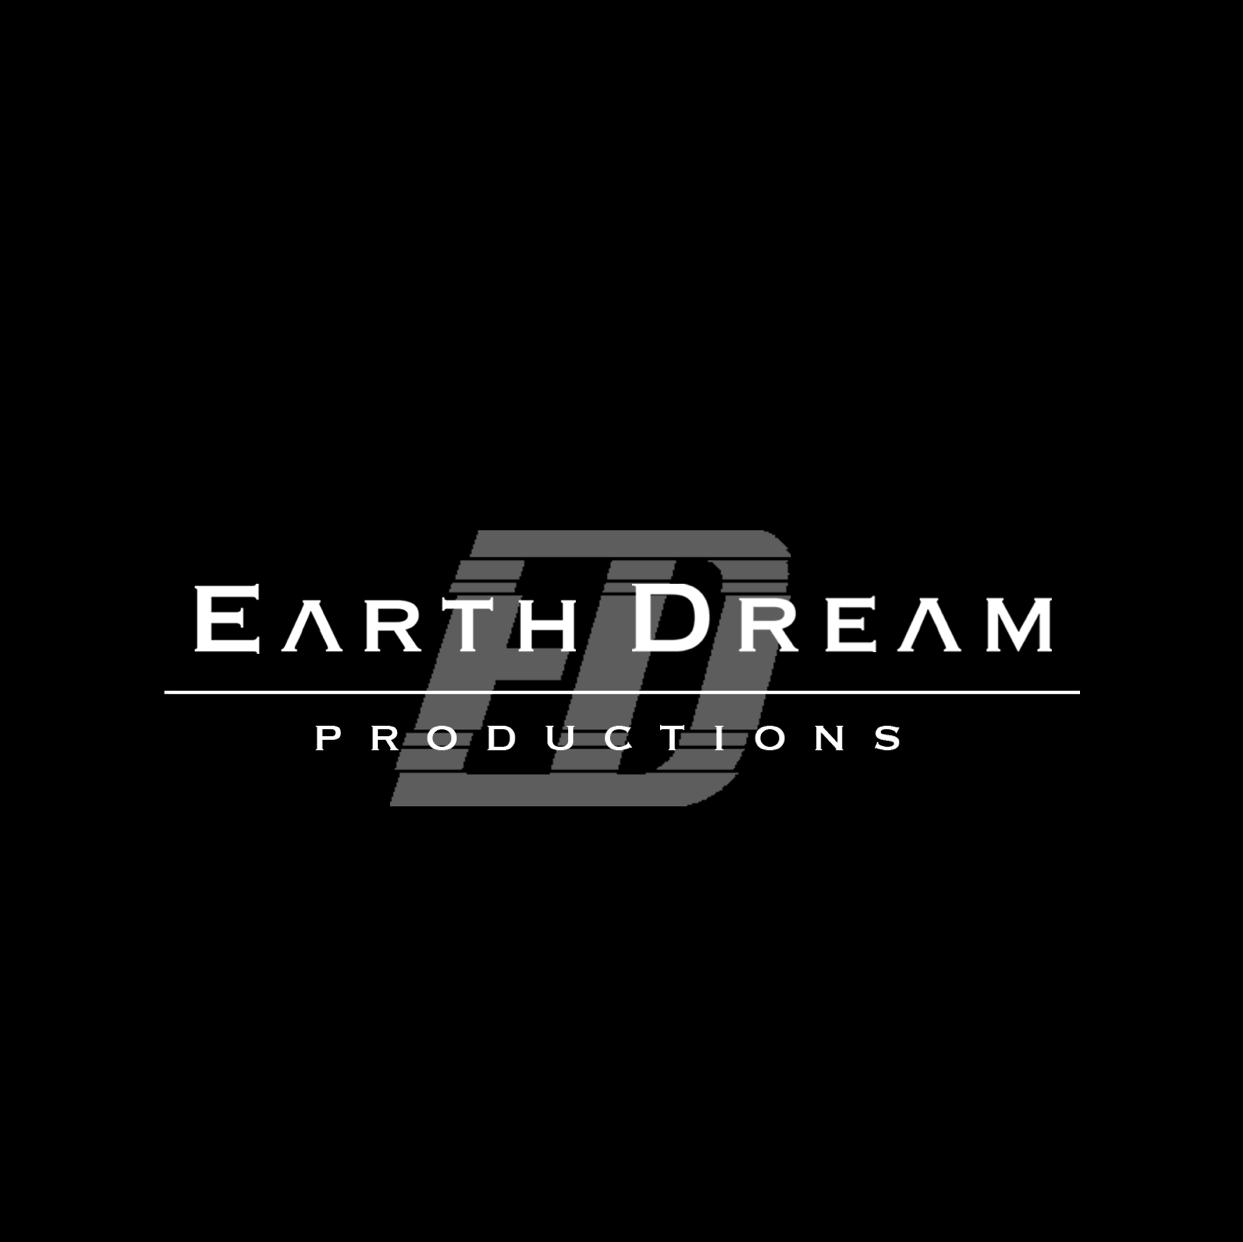 Earth Dream 影像